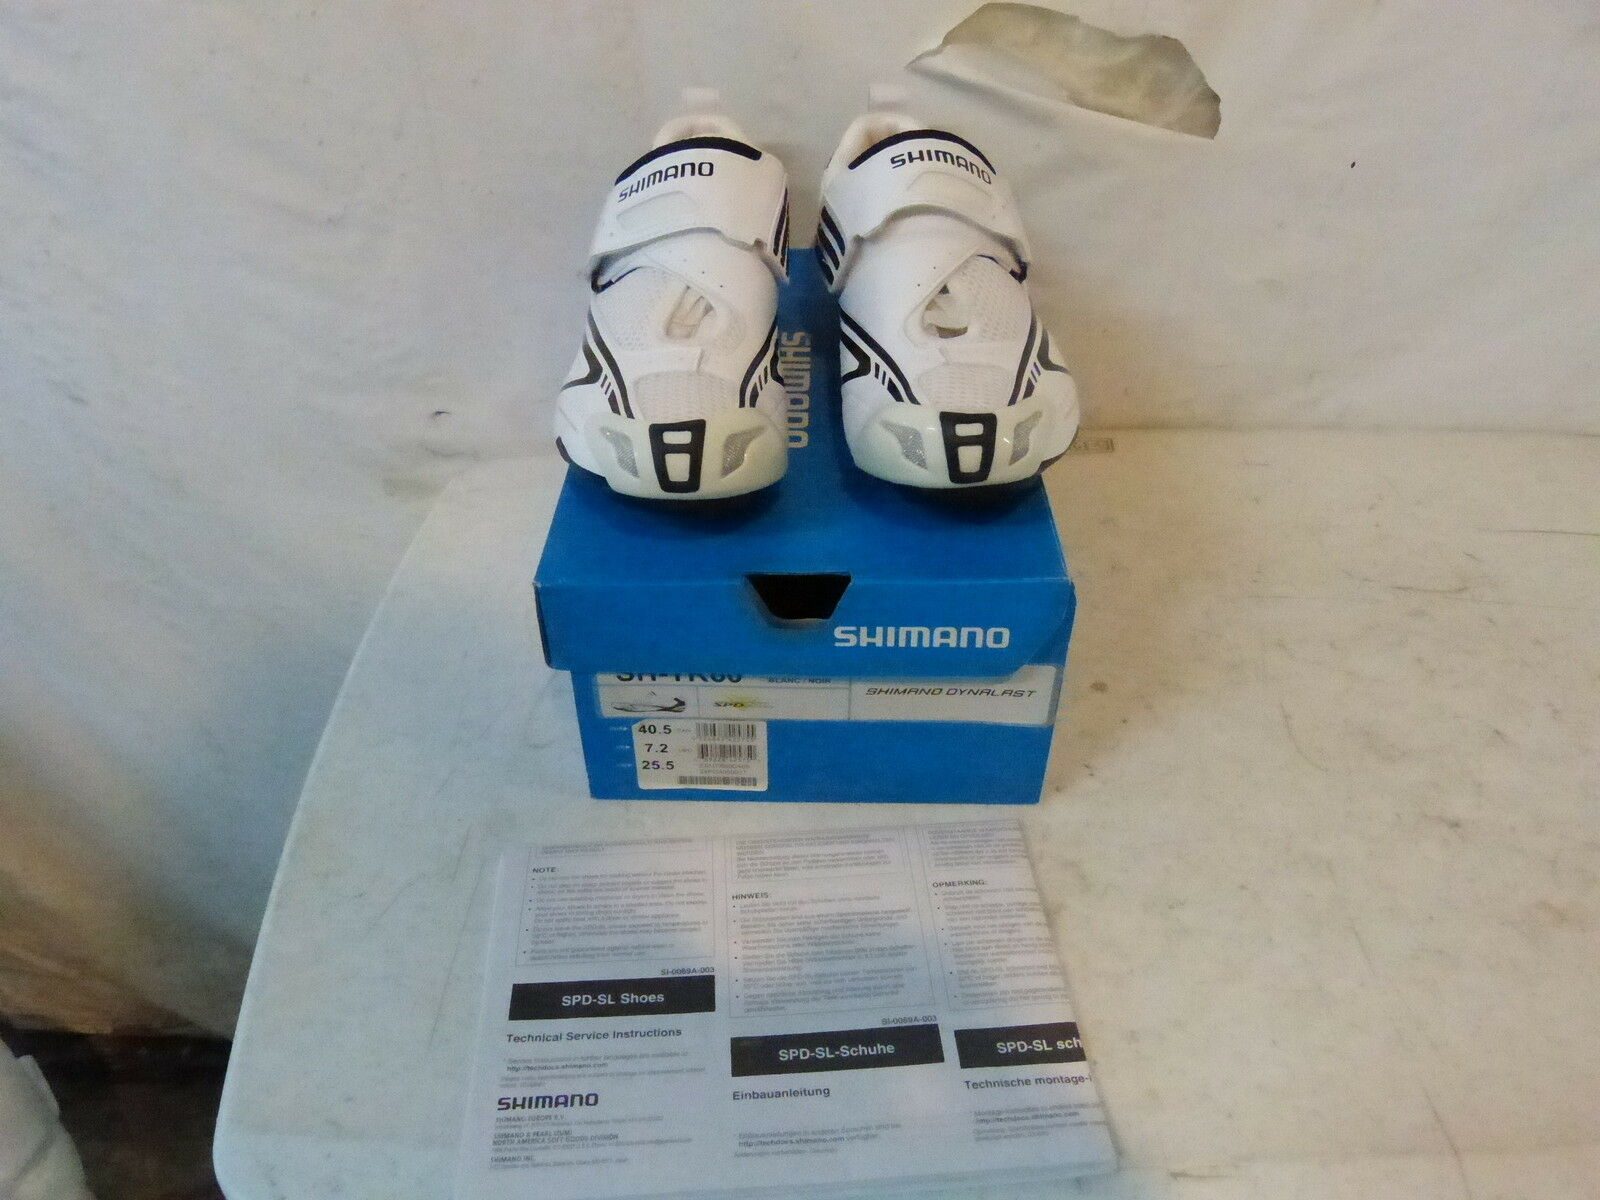 Shimano SH-TR60 Para hombre Zapatos EU 40.5 nos 7.2 al por menor  250 blancoo Negro